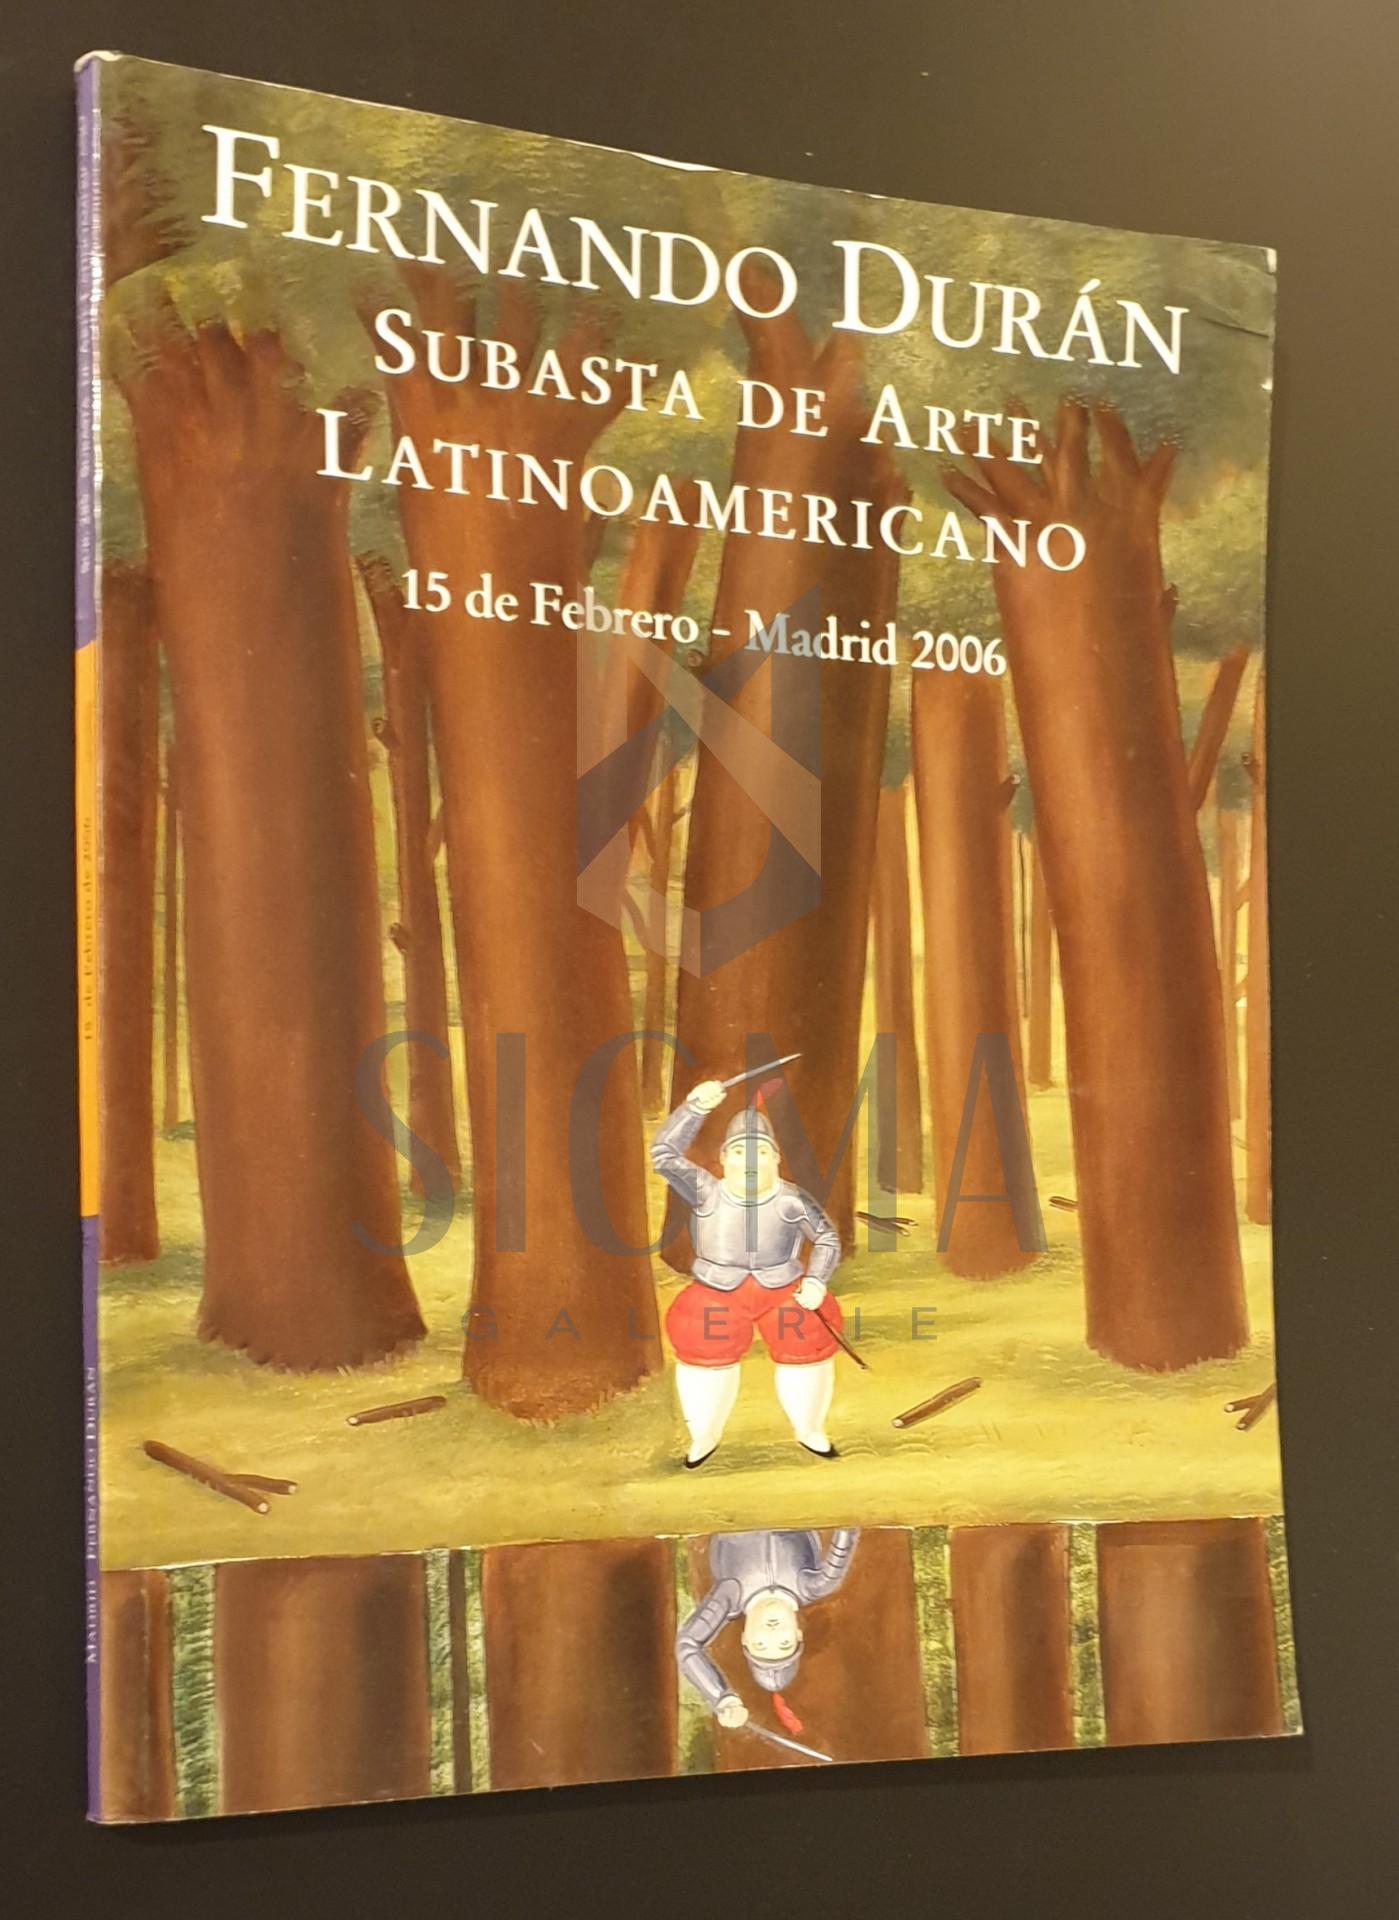 Catalog de expozitie  *  Fernando Duran subasta de arte latino-americano, 15 Februarie 2006 - Madrid